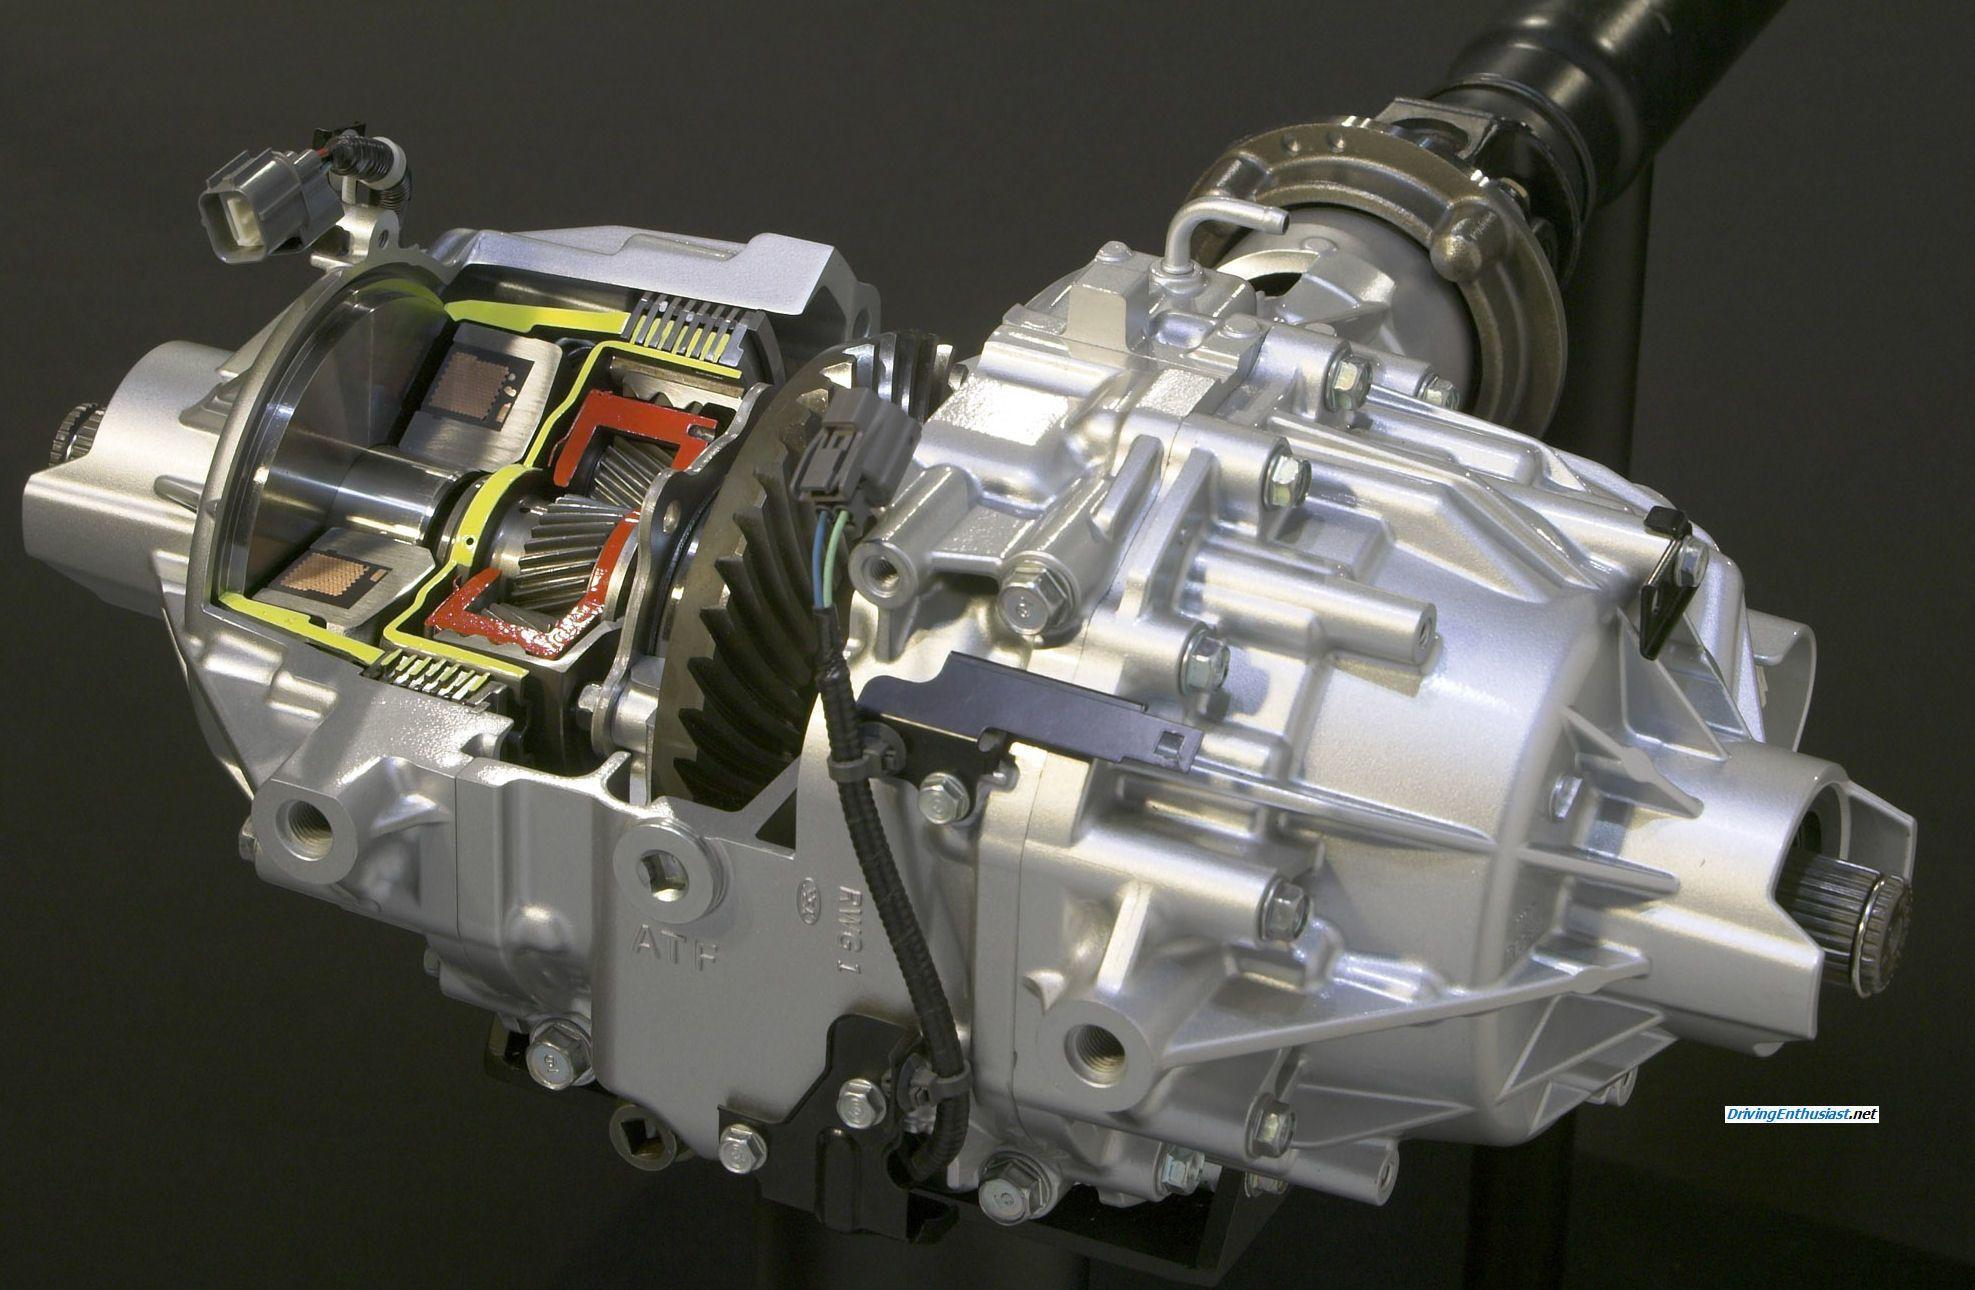 2007 Acura Rdx Engine Diagram Wiring Lexus RDX Brochure 2007 Acura Rdx Engine  Diagram